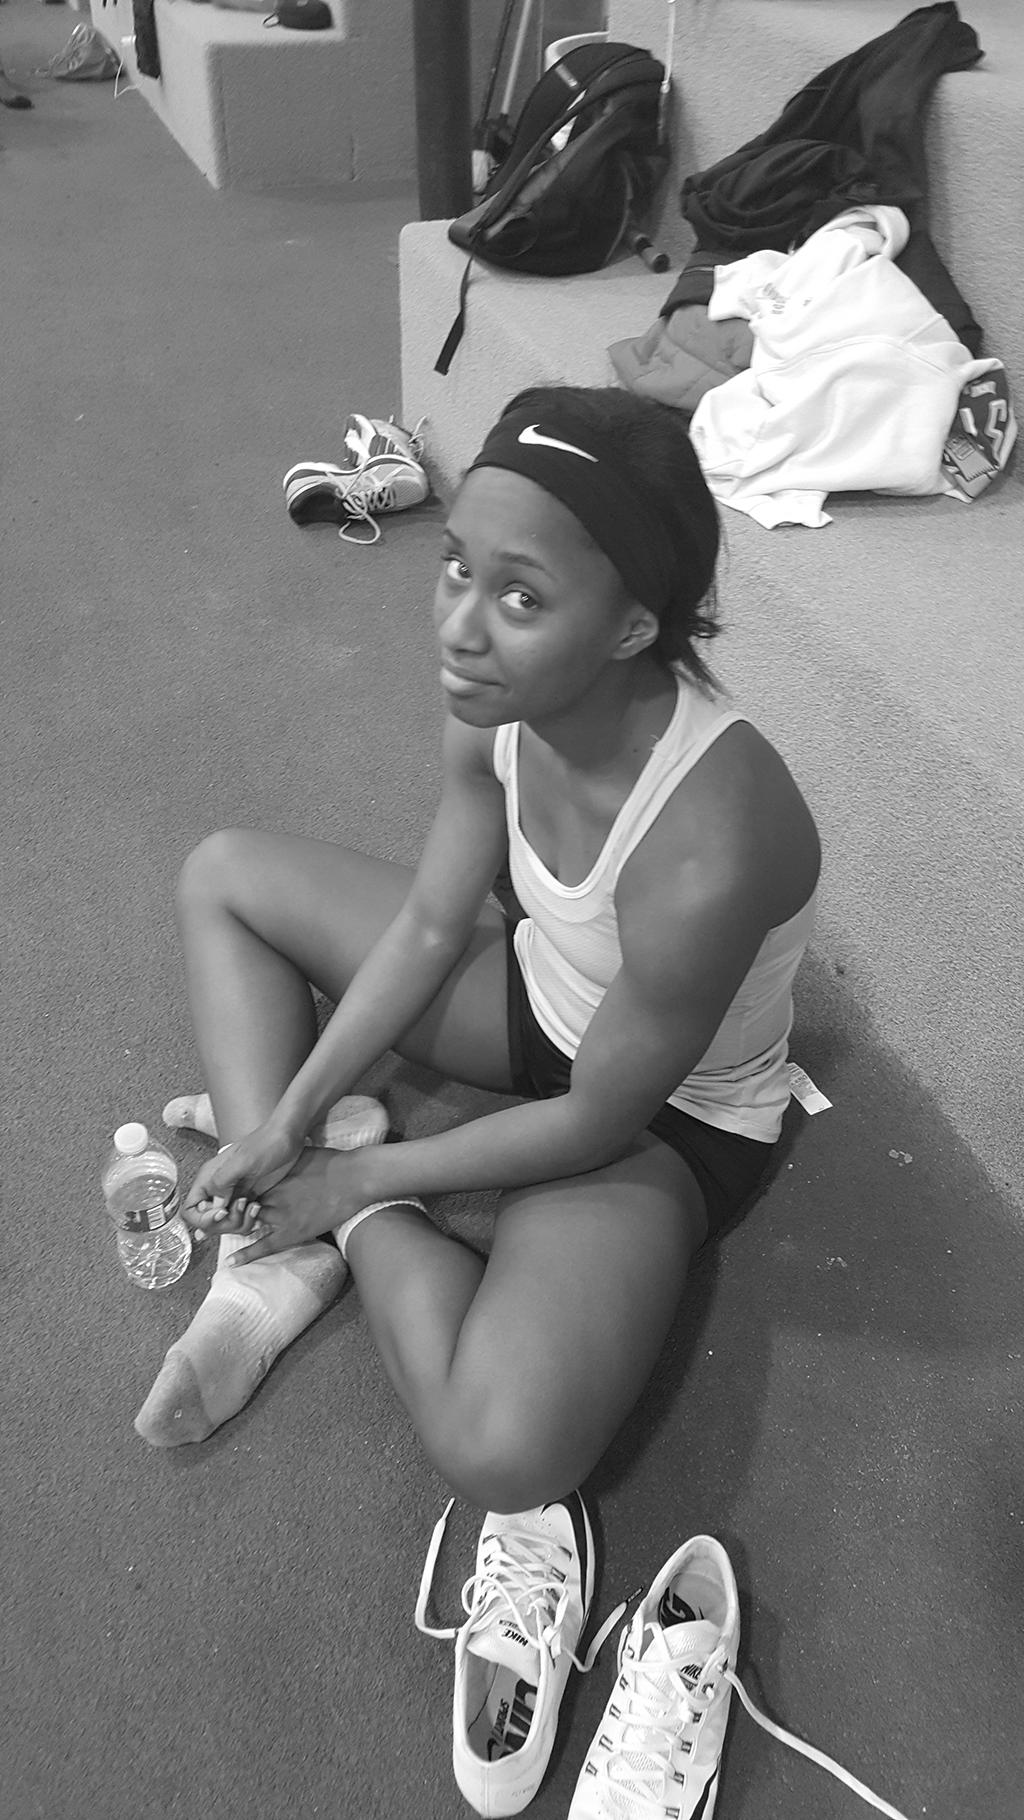 Ebony resting after a hard practice